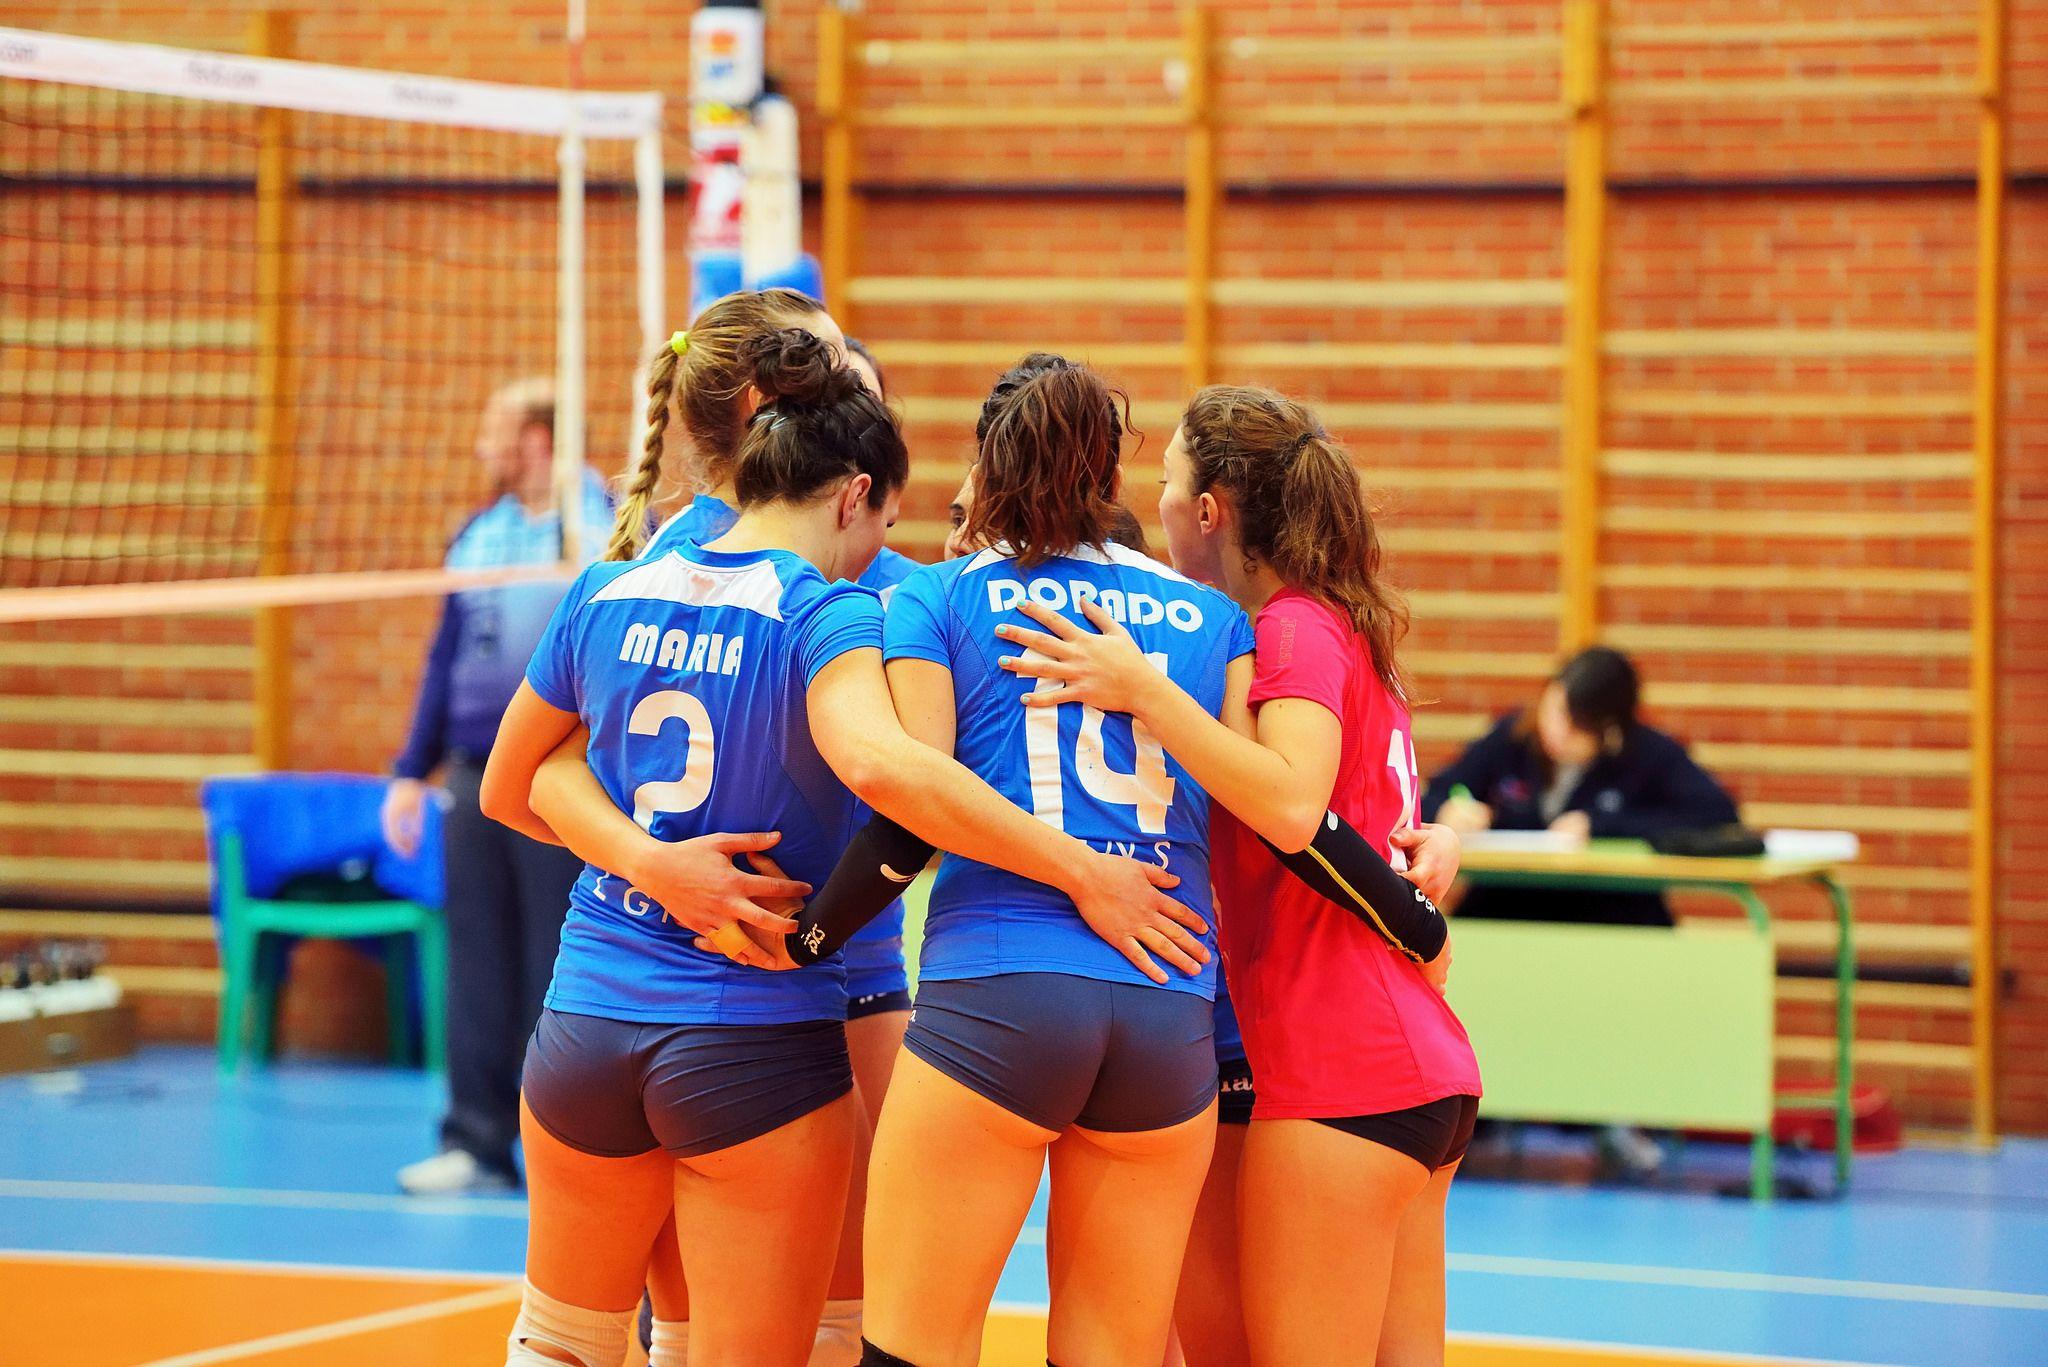 Pin By Fereydoun Rostam On Spor In 2020 Korean Girl Fashion Volleyball Players Athlete